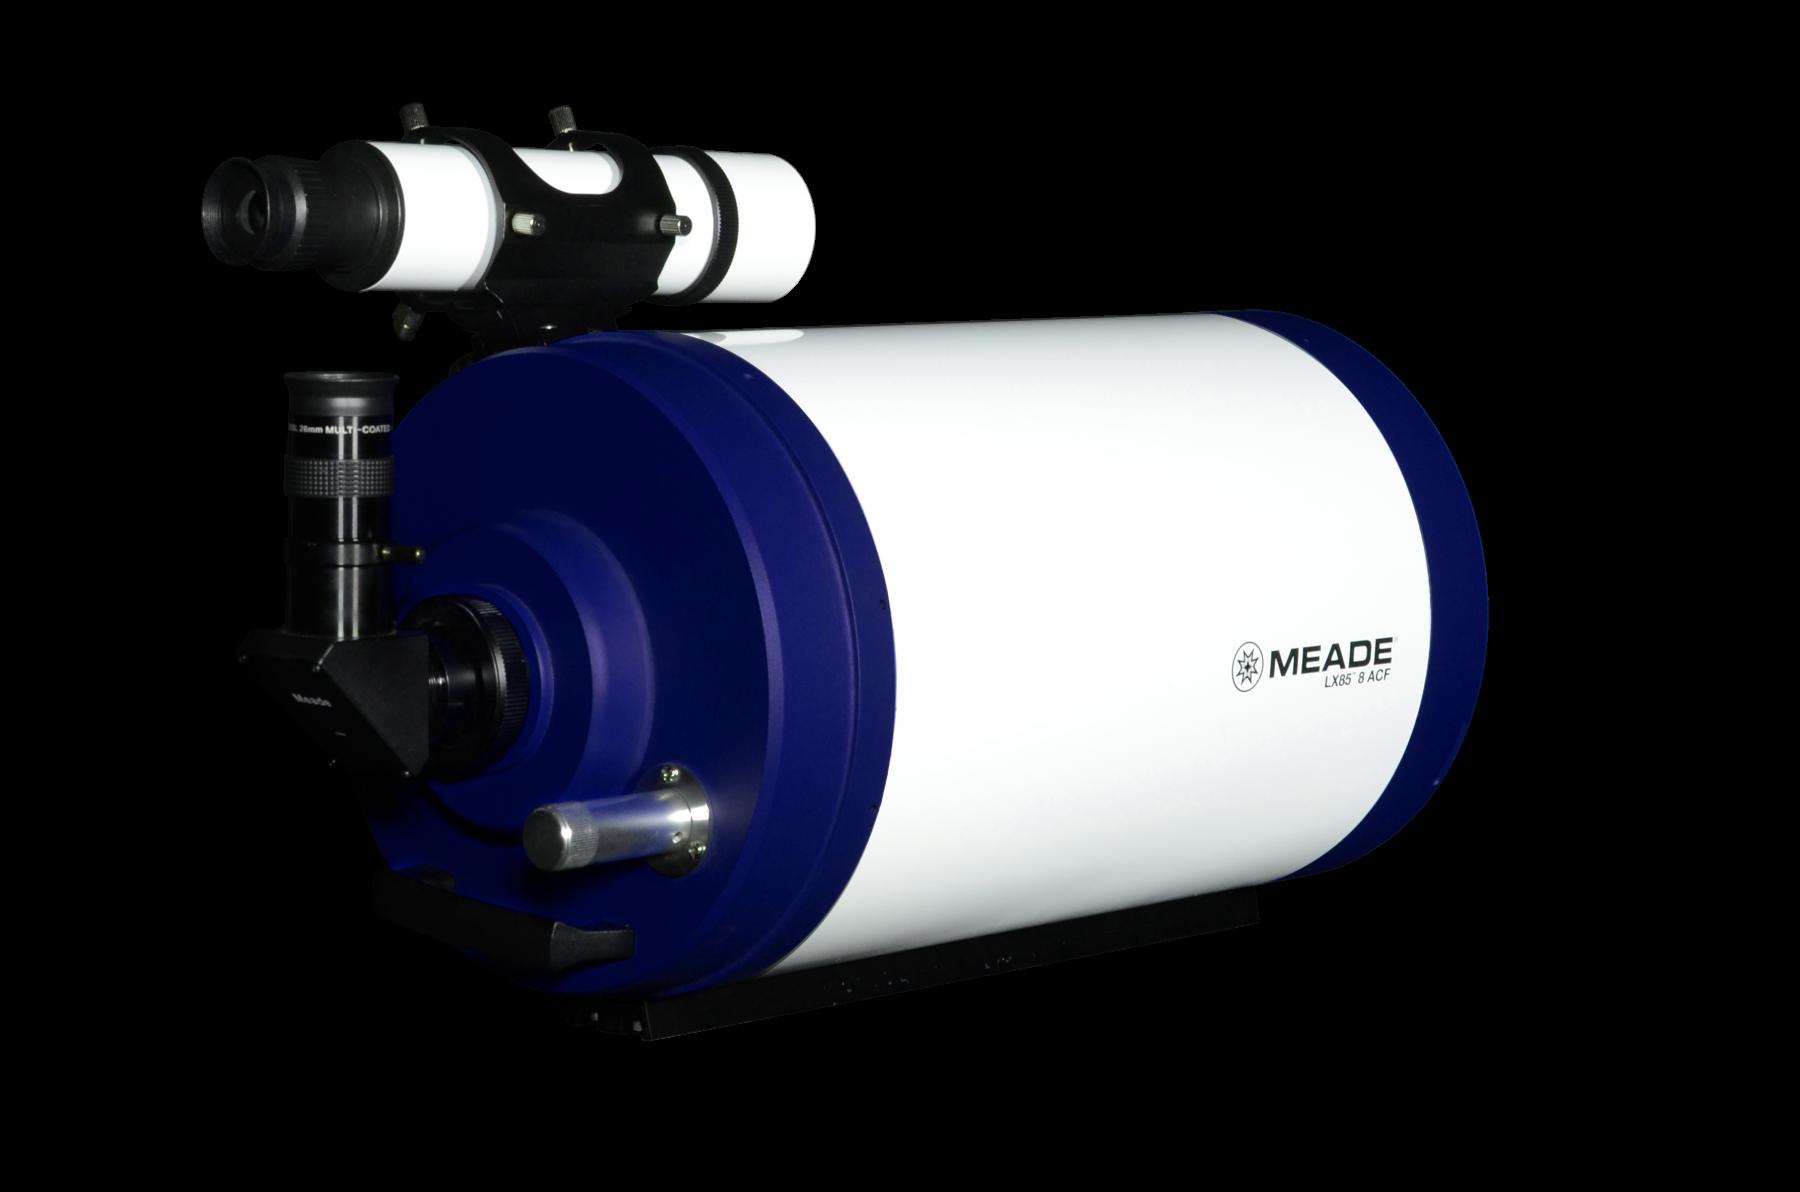 Buy Meade LX85 6 ACF OTA in online shop